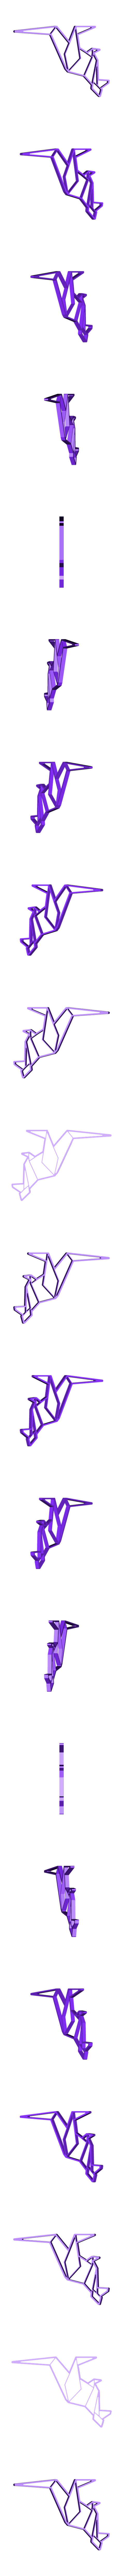 customized_origami_kangaroo.stl Download free STL file Customizable Origami Kangaroo • 3D print model, MightyNozzle